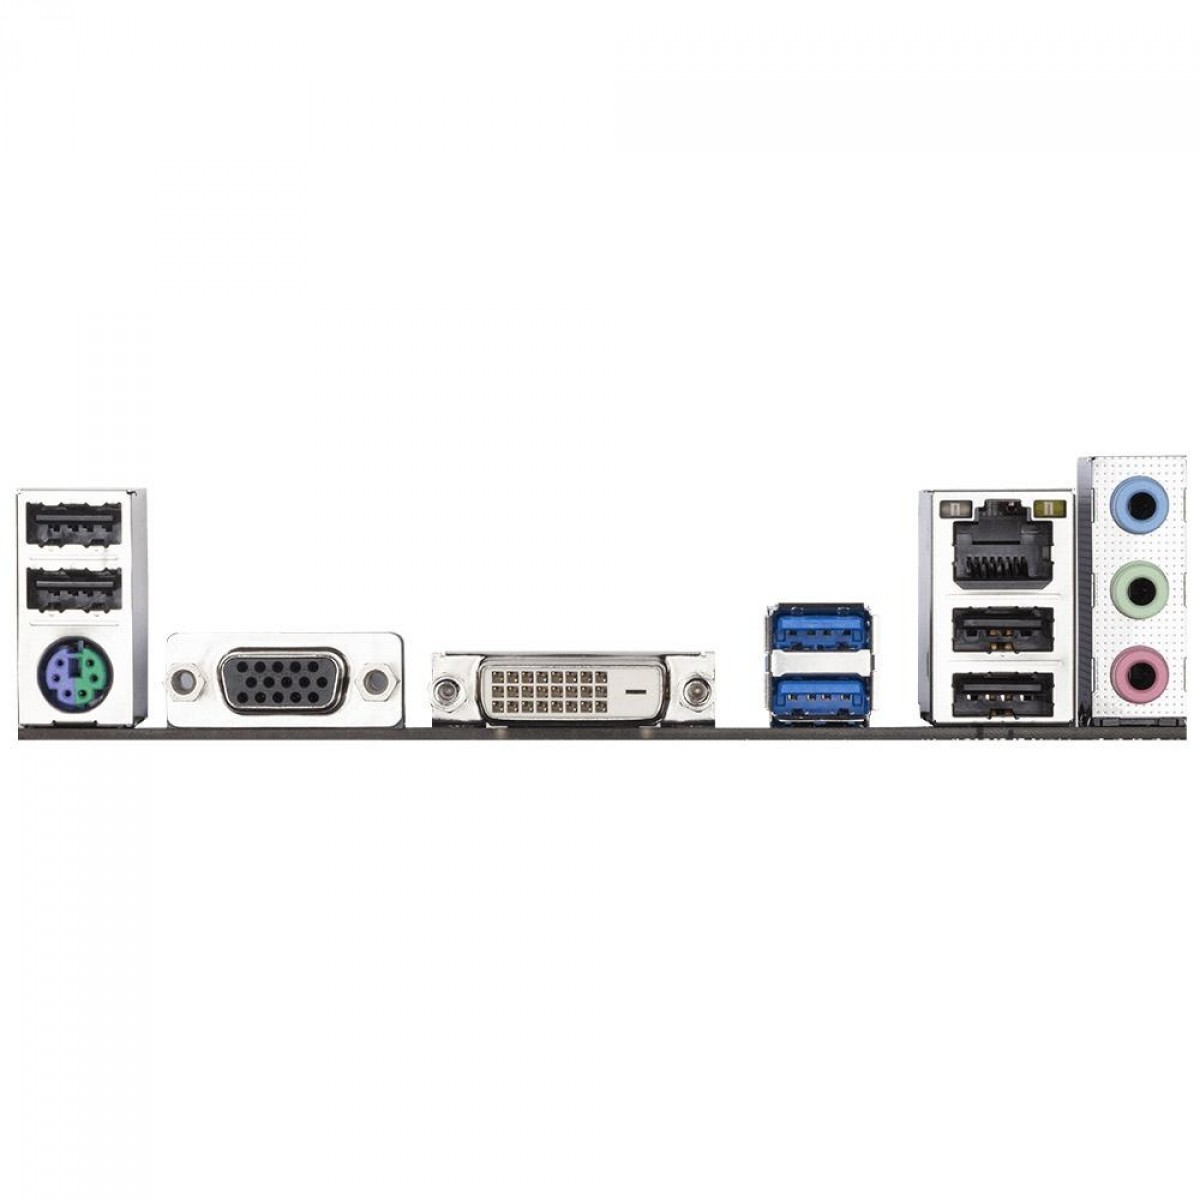 Placa Mãe Gigabyte H410M DS2V, Chipset H410, Intel LGA 1200, mATX, DDR4